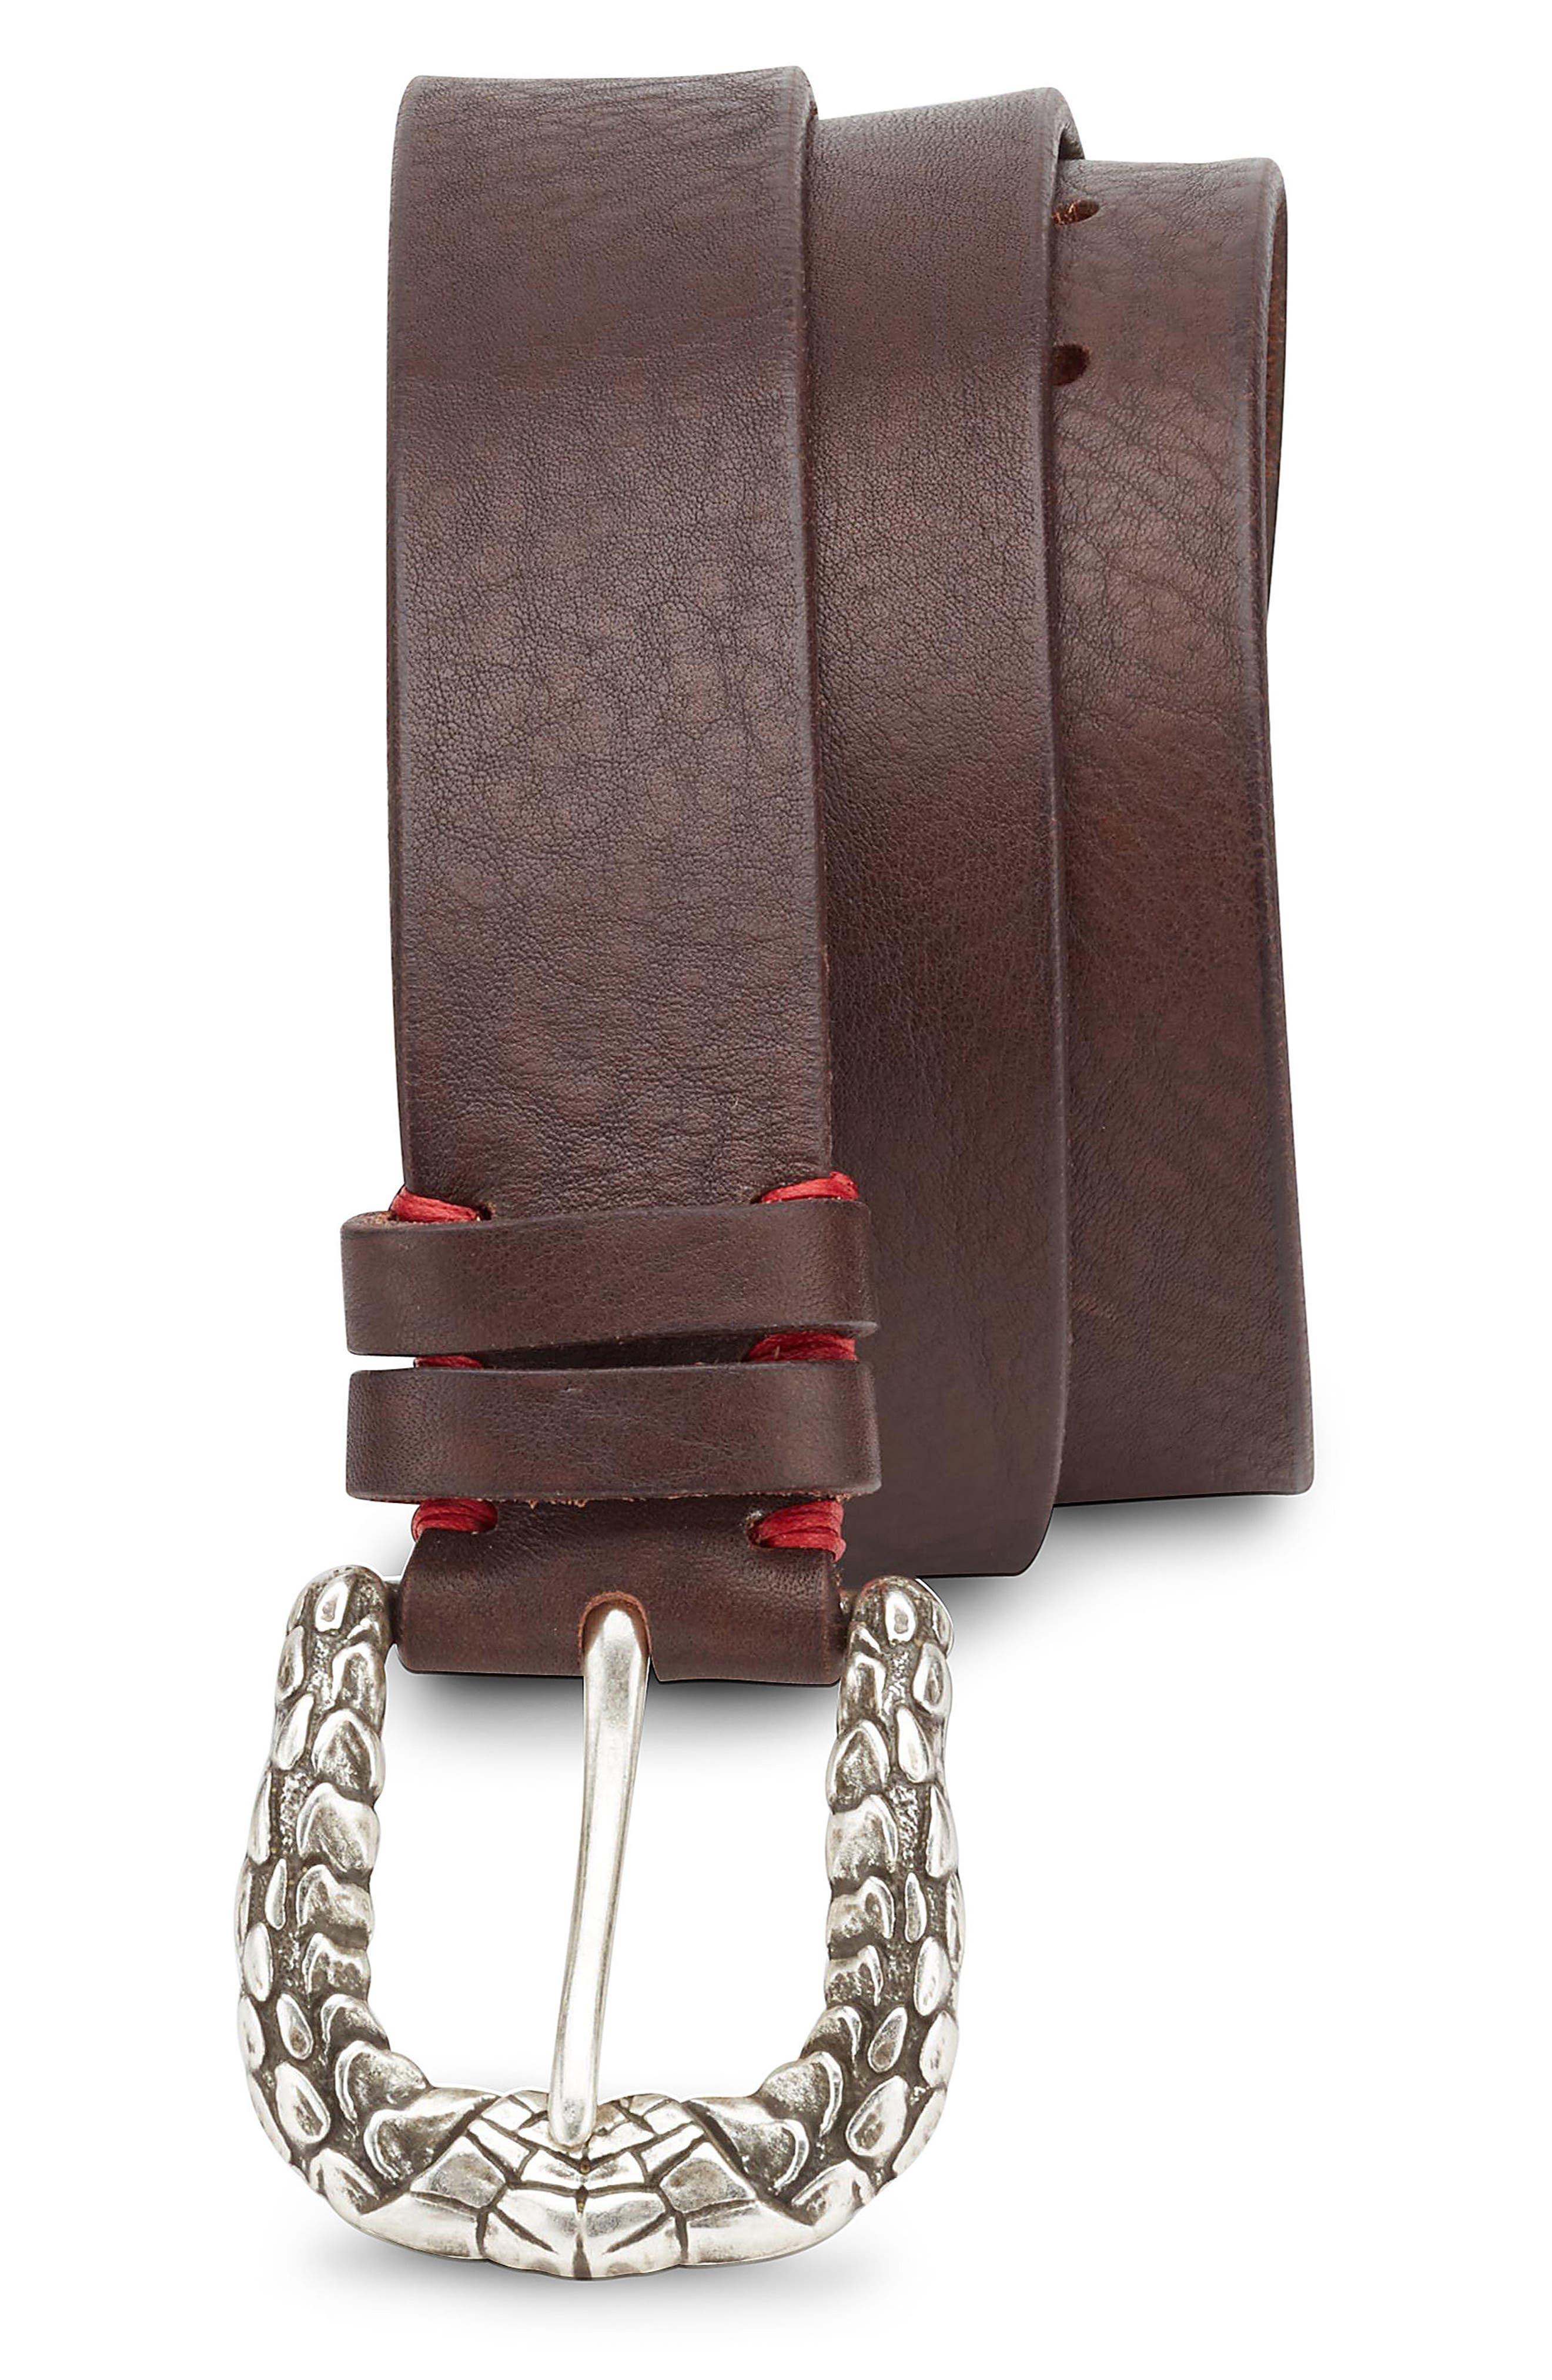 Snakeskin Buckle Leather Belt,                             Main thumbnail 1, color,                             Black